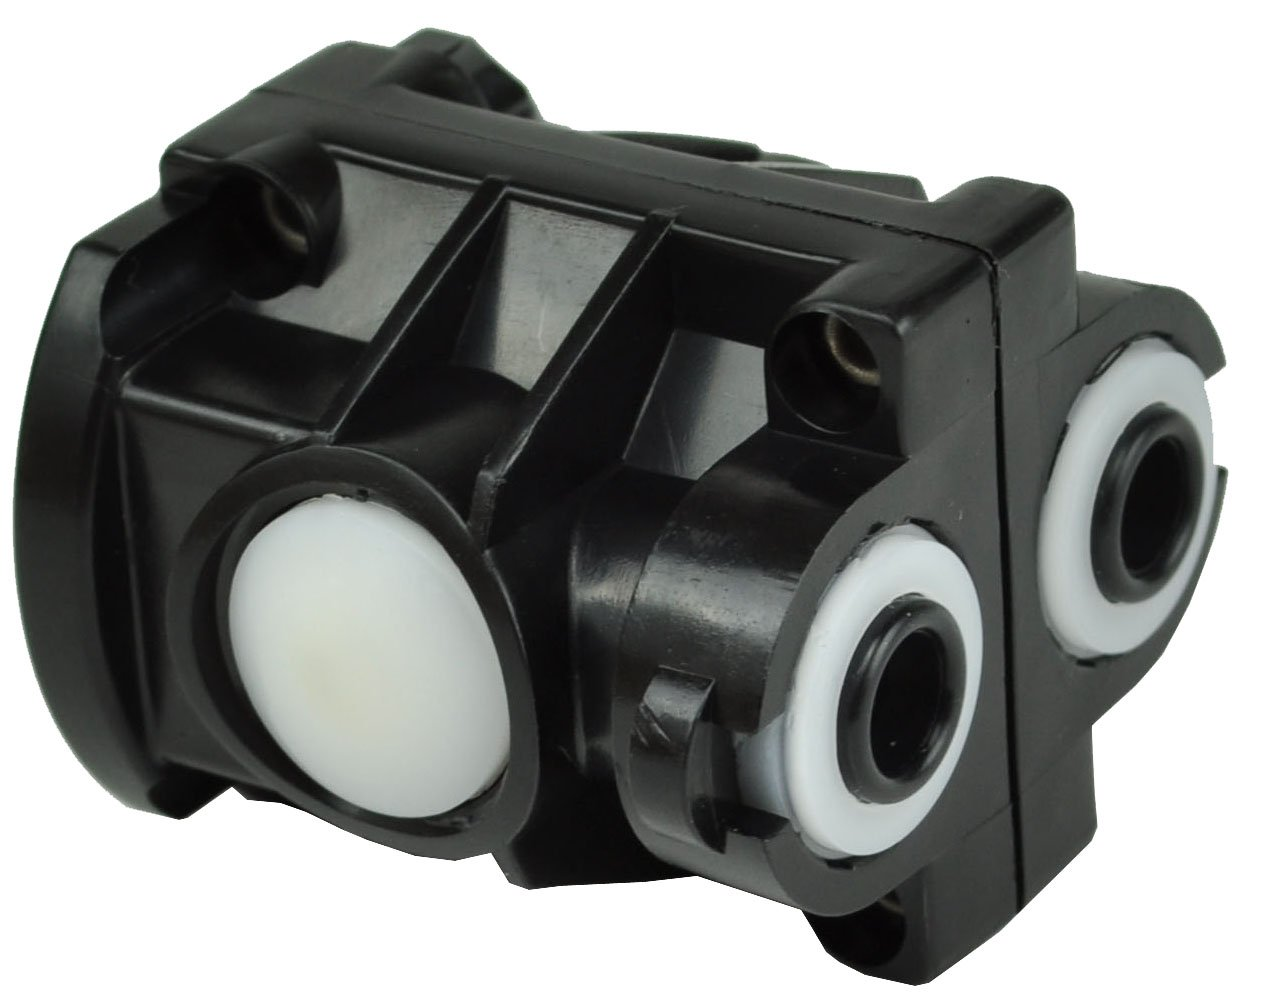 Generic Price Pfister 974-491 Faucet Cartridge -By Plumb USA 34400